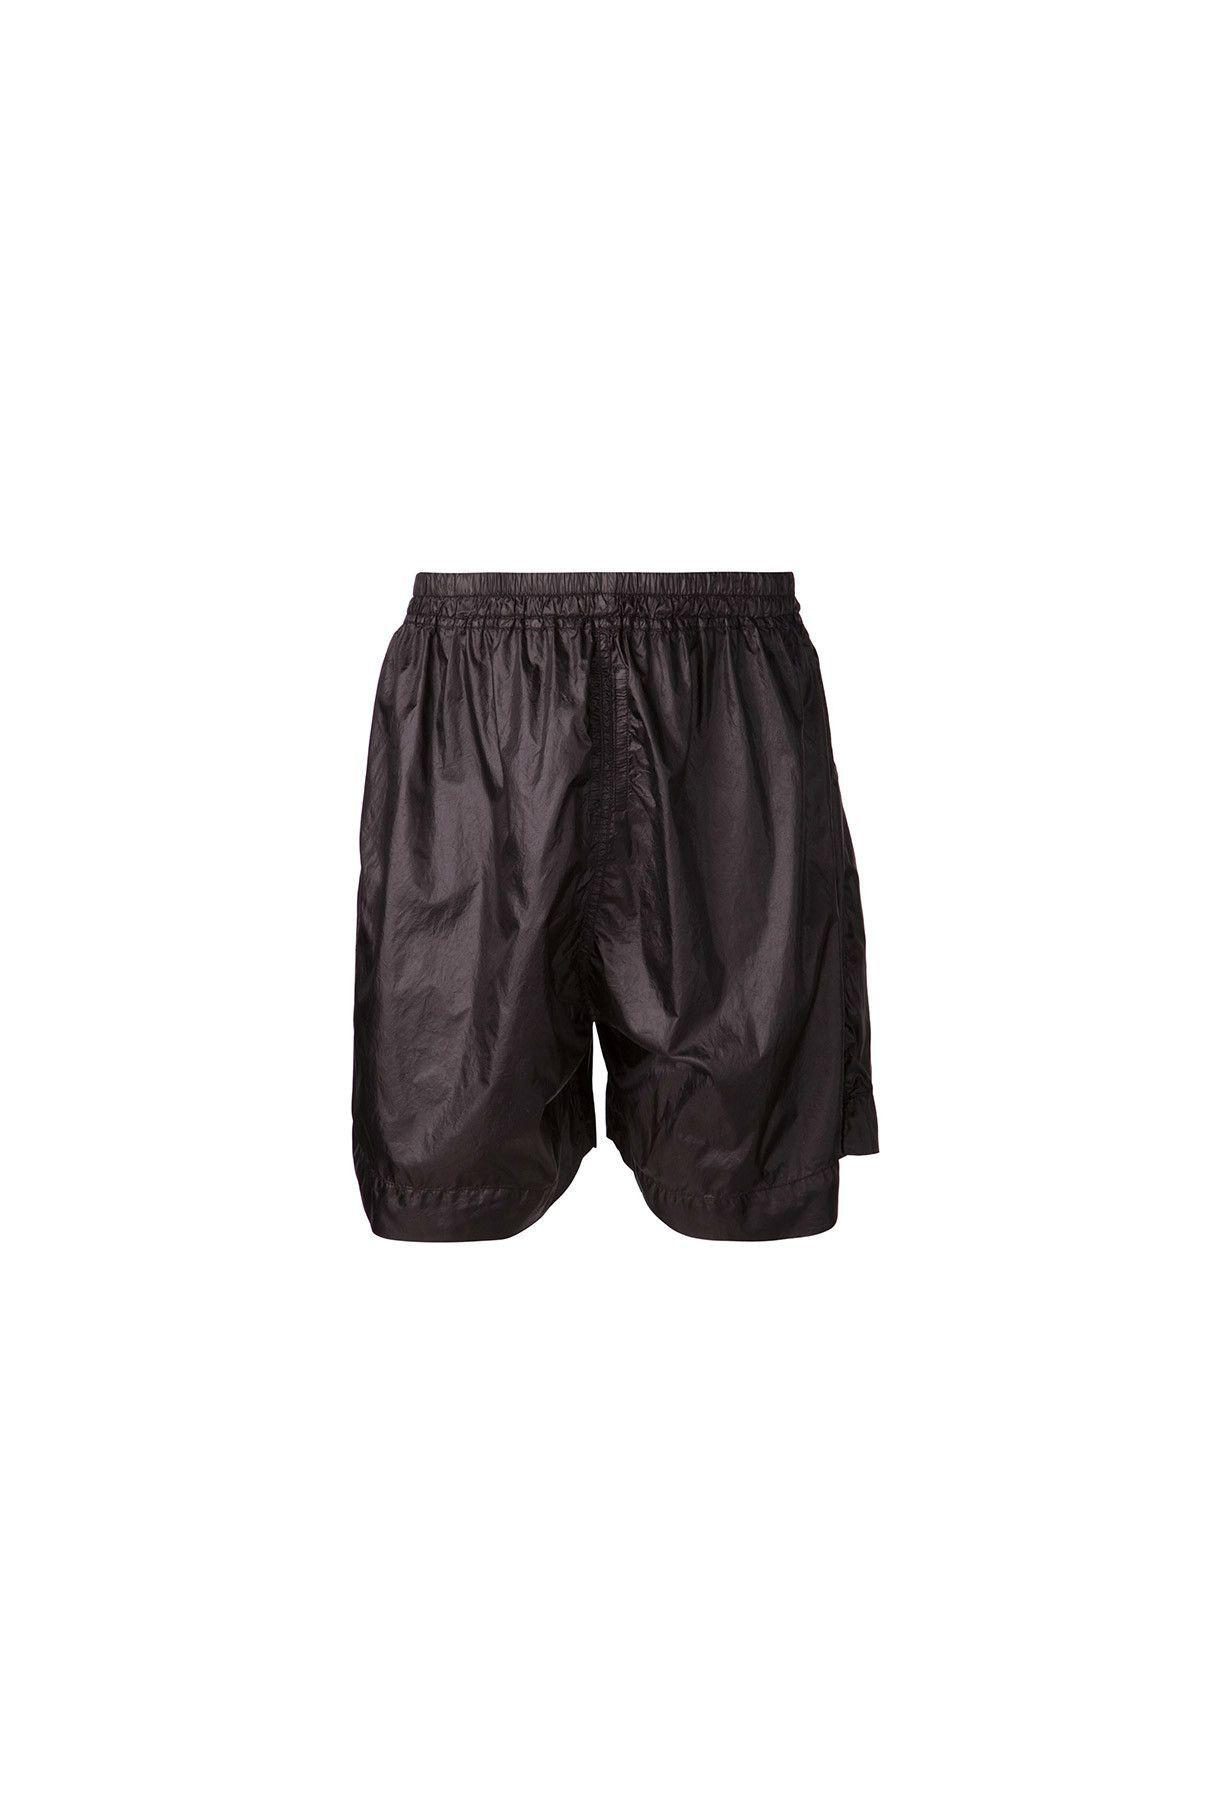 {DRKSHDW / 01 clothing / 03 bottom / 03 short} Boxer Shorts